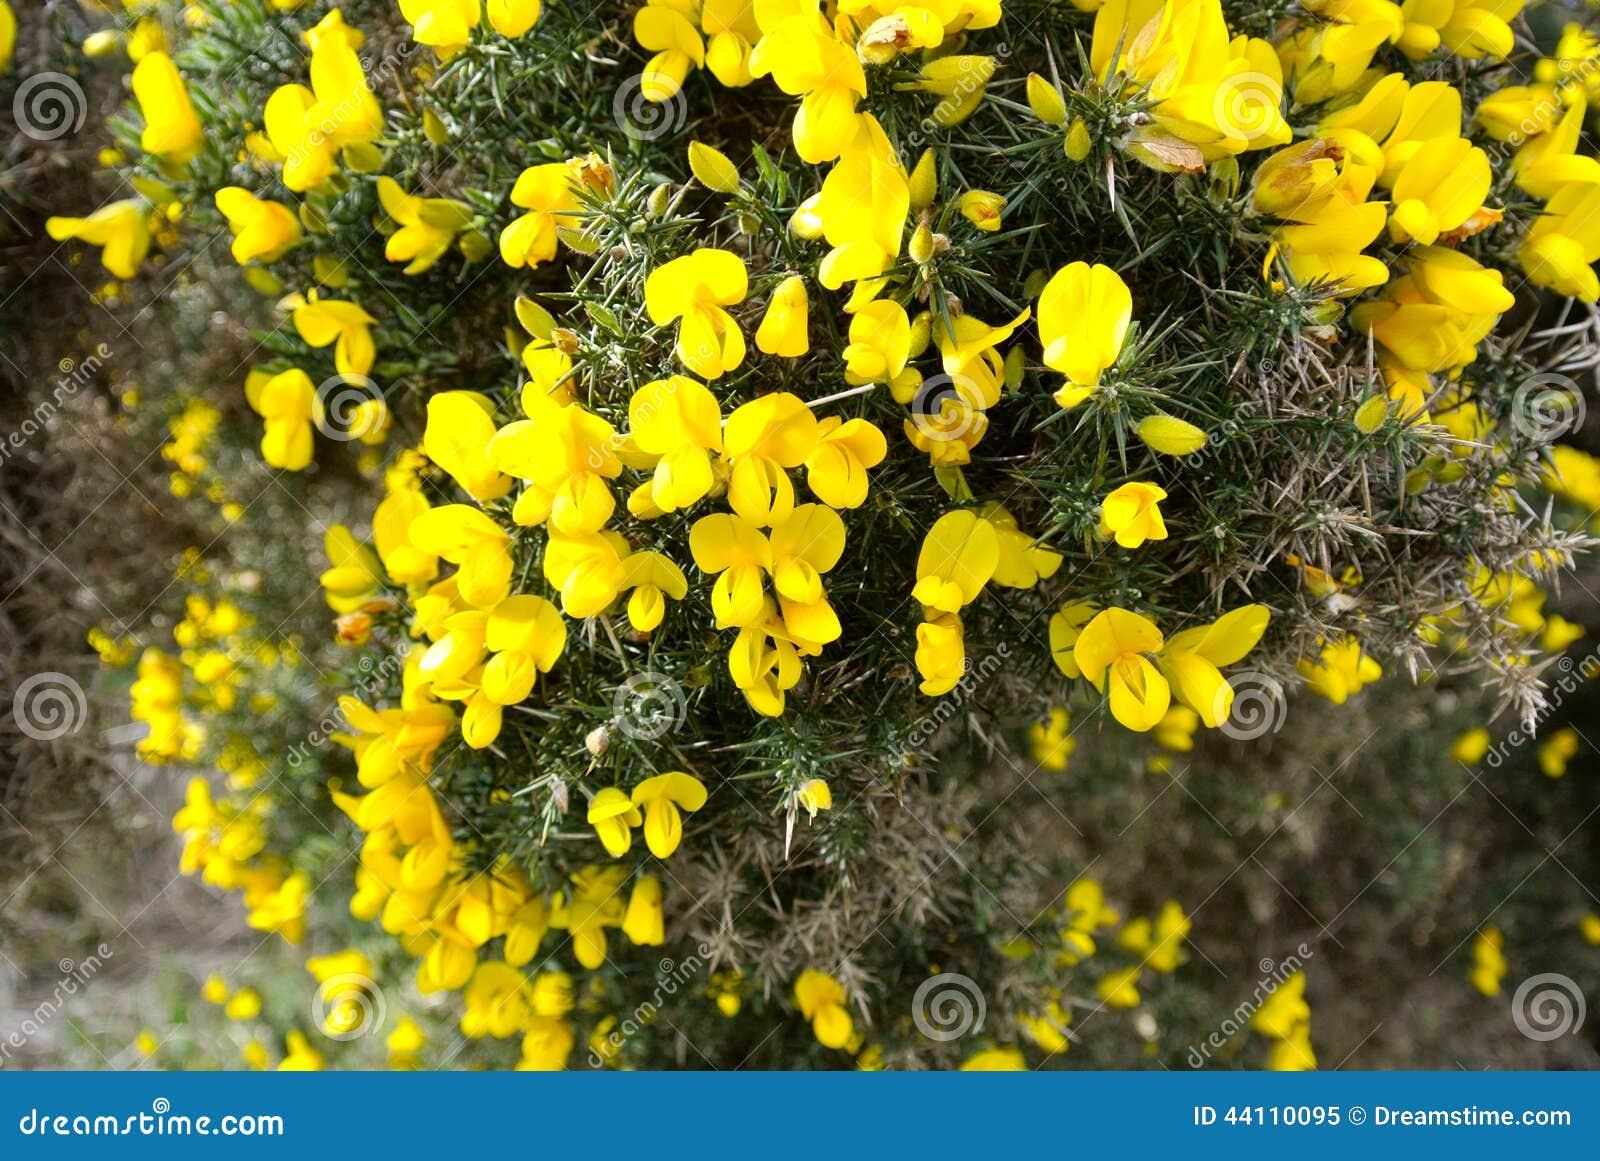 Yellow flowers ireland stock photo 44110095 megapixl yellow flowers ireland mightylinksfo